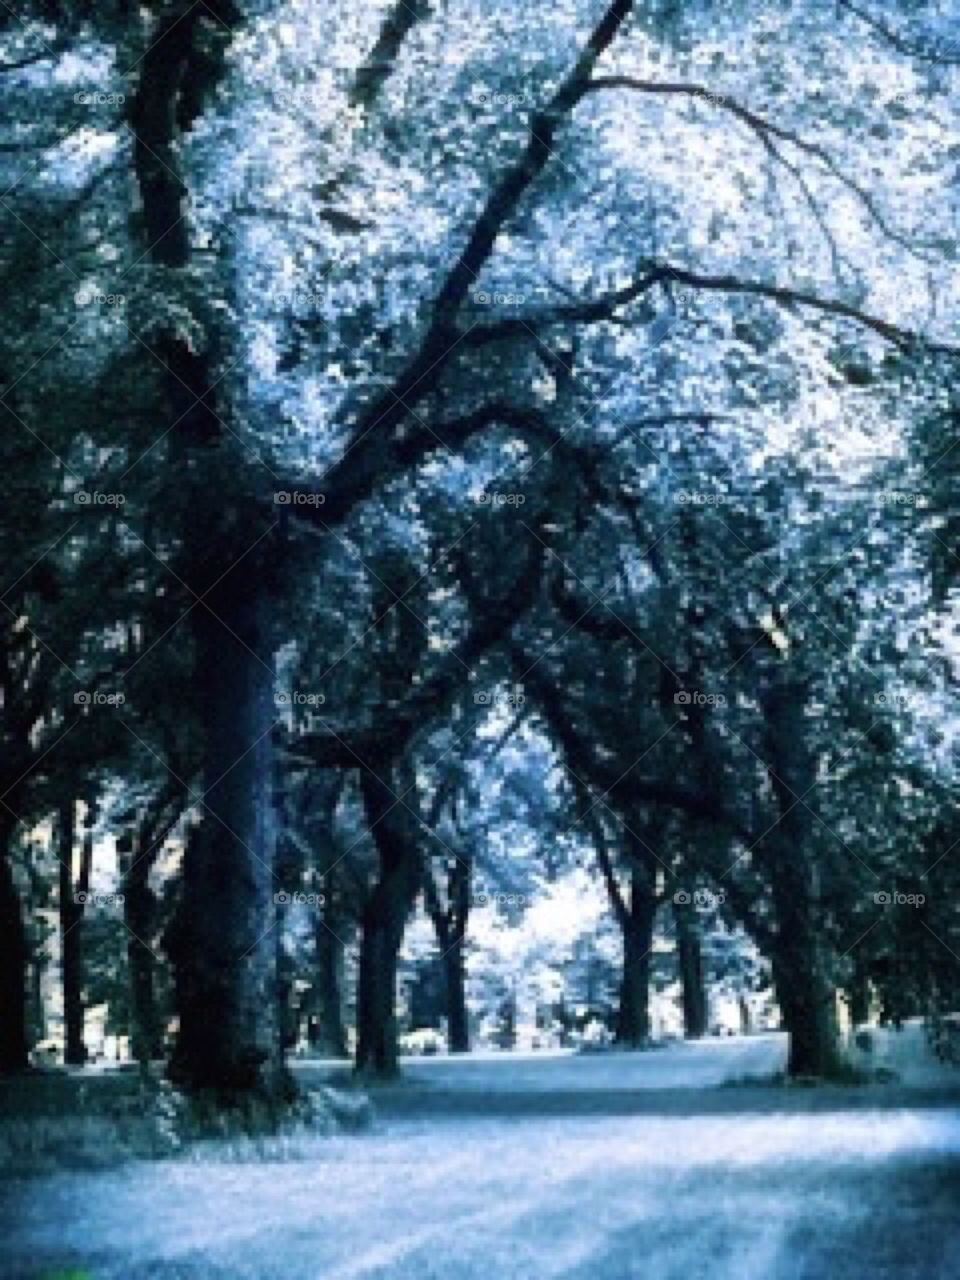 Elm Trees - Central Park, Manhattan, New York City.